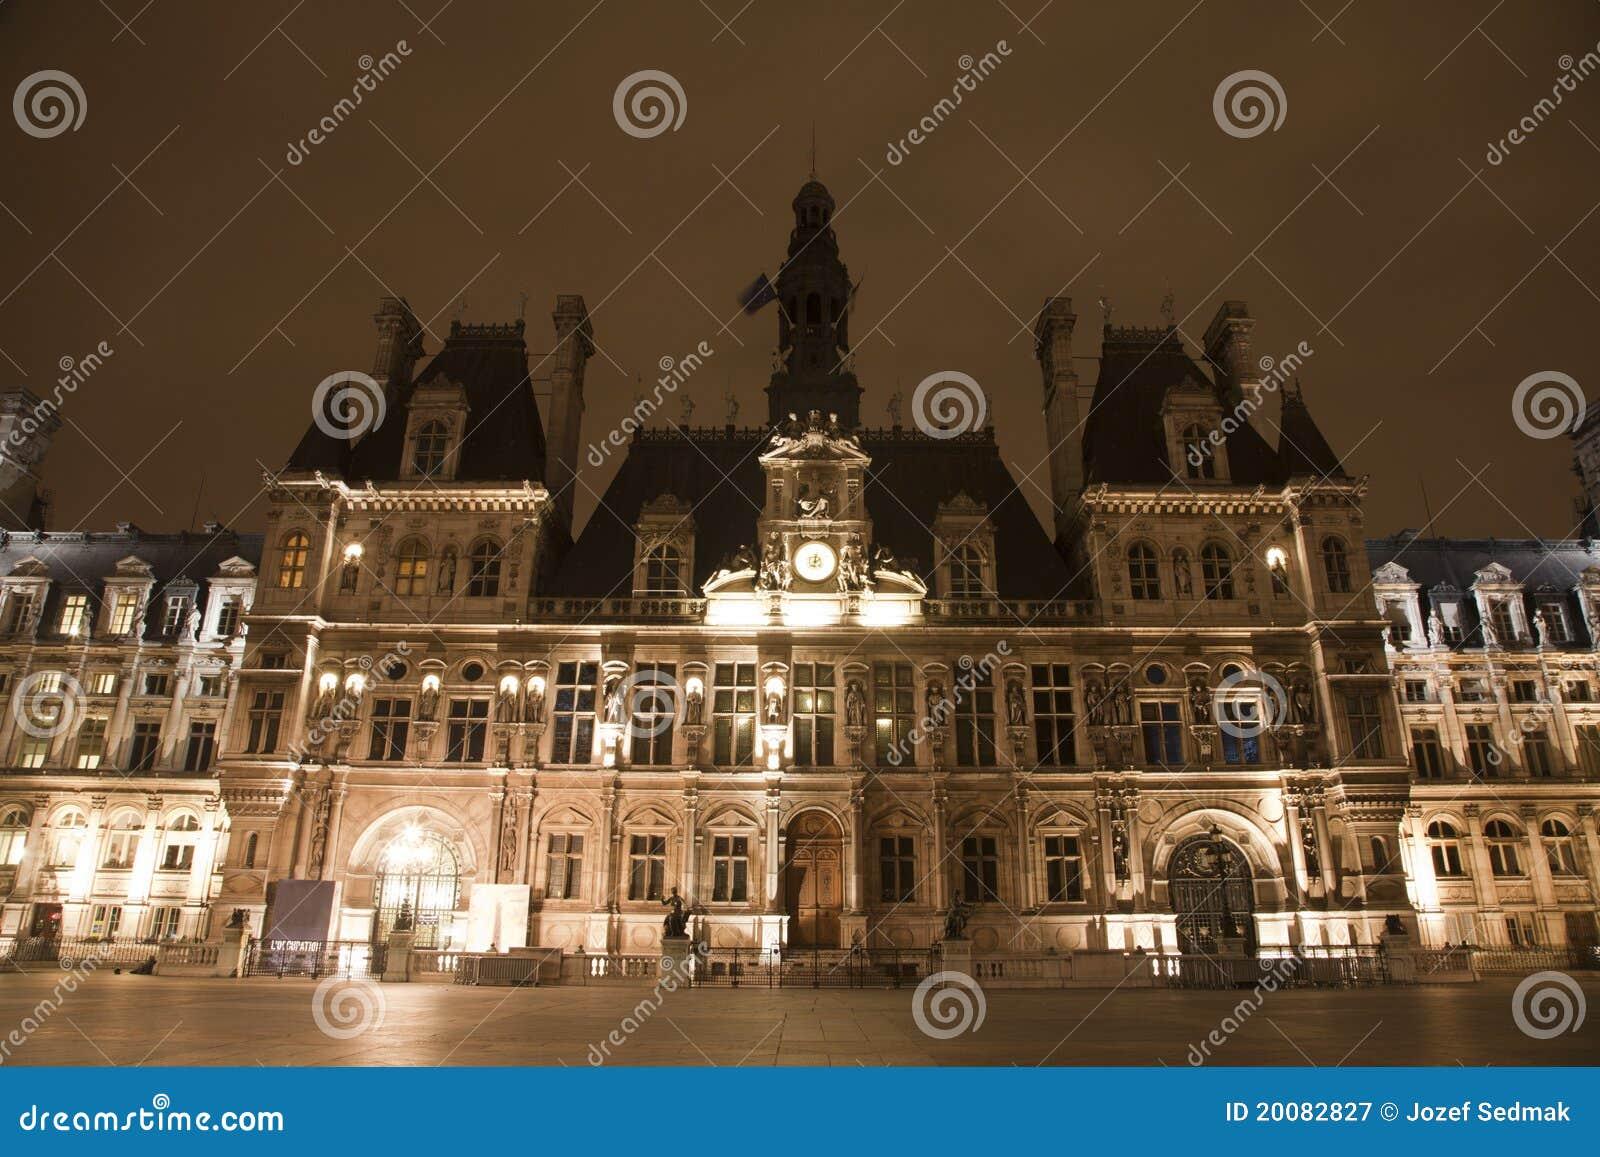 Paris Hotel De Ville In The Night Royalty Free Stock